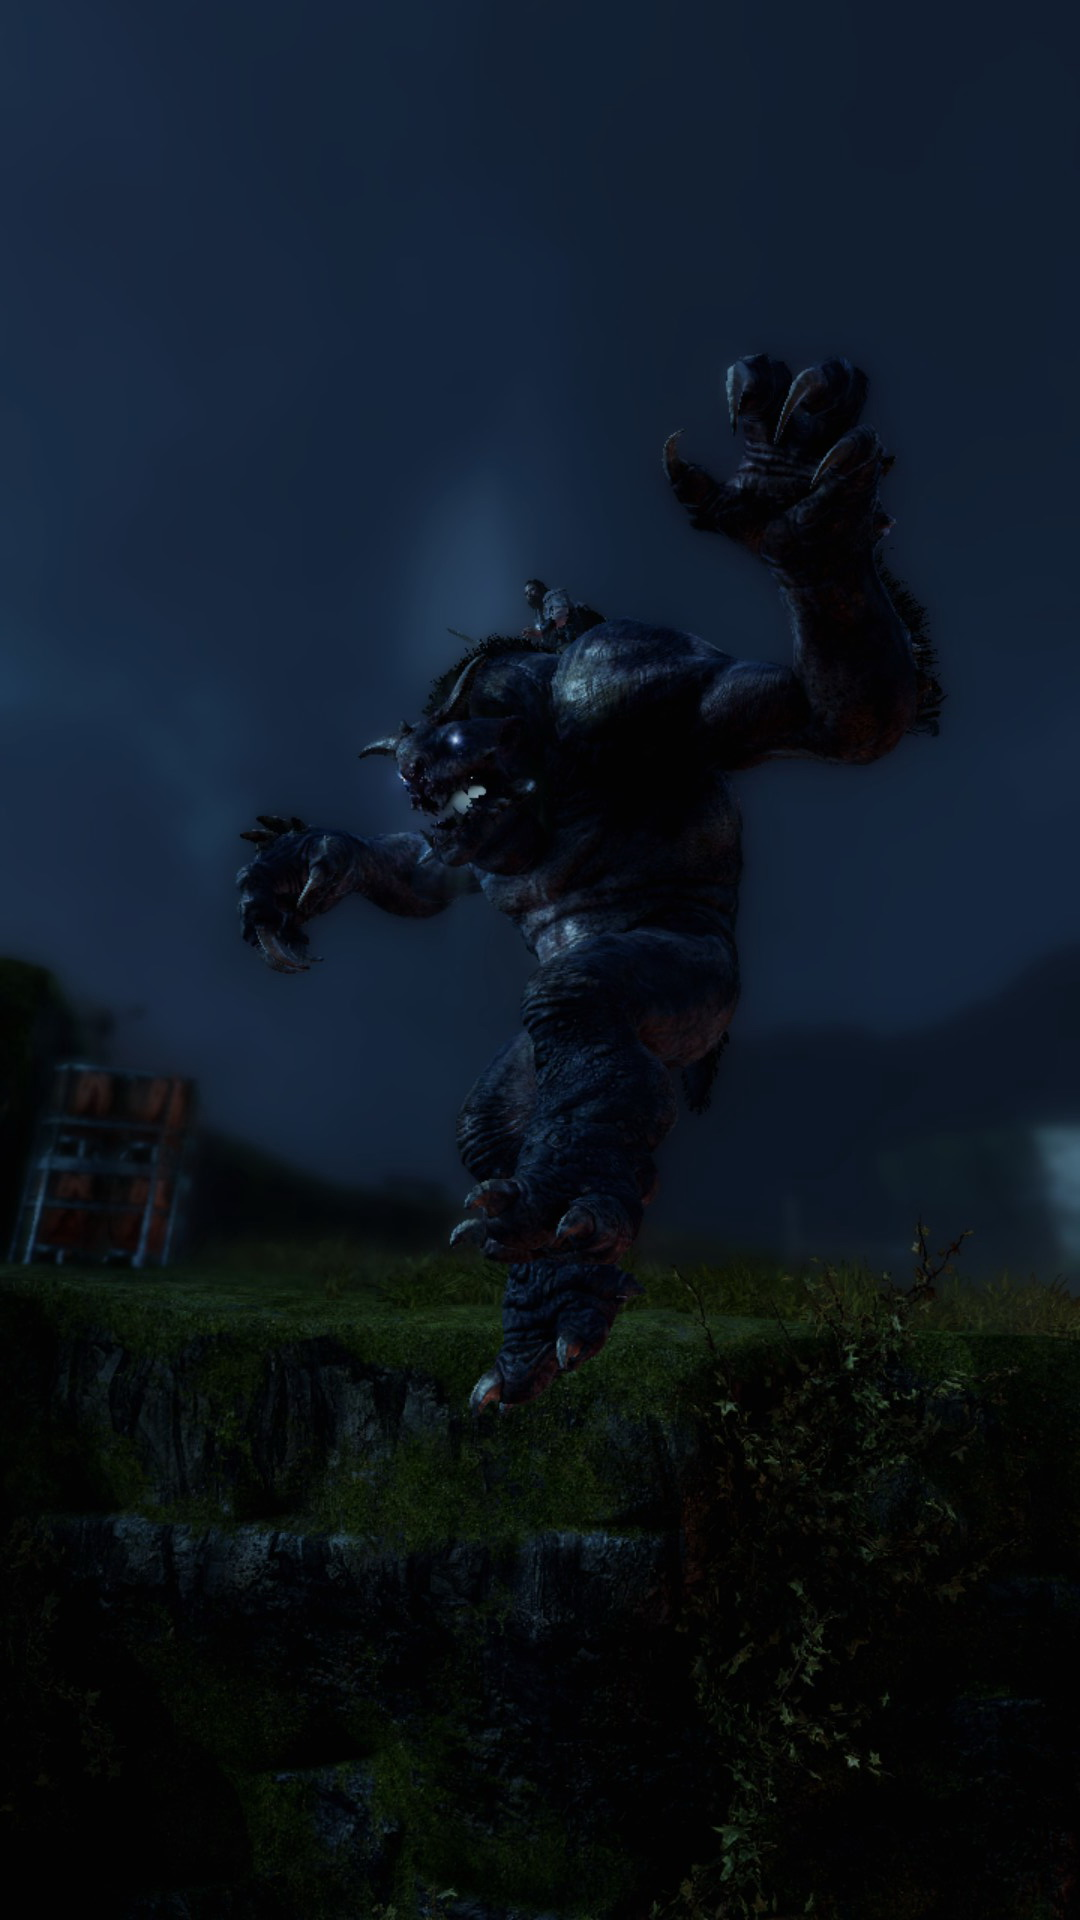 20200913155929_1.jpg - Middle-earth: Shadow of Mordor